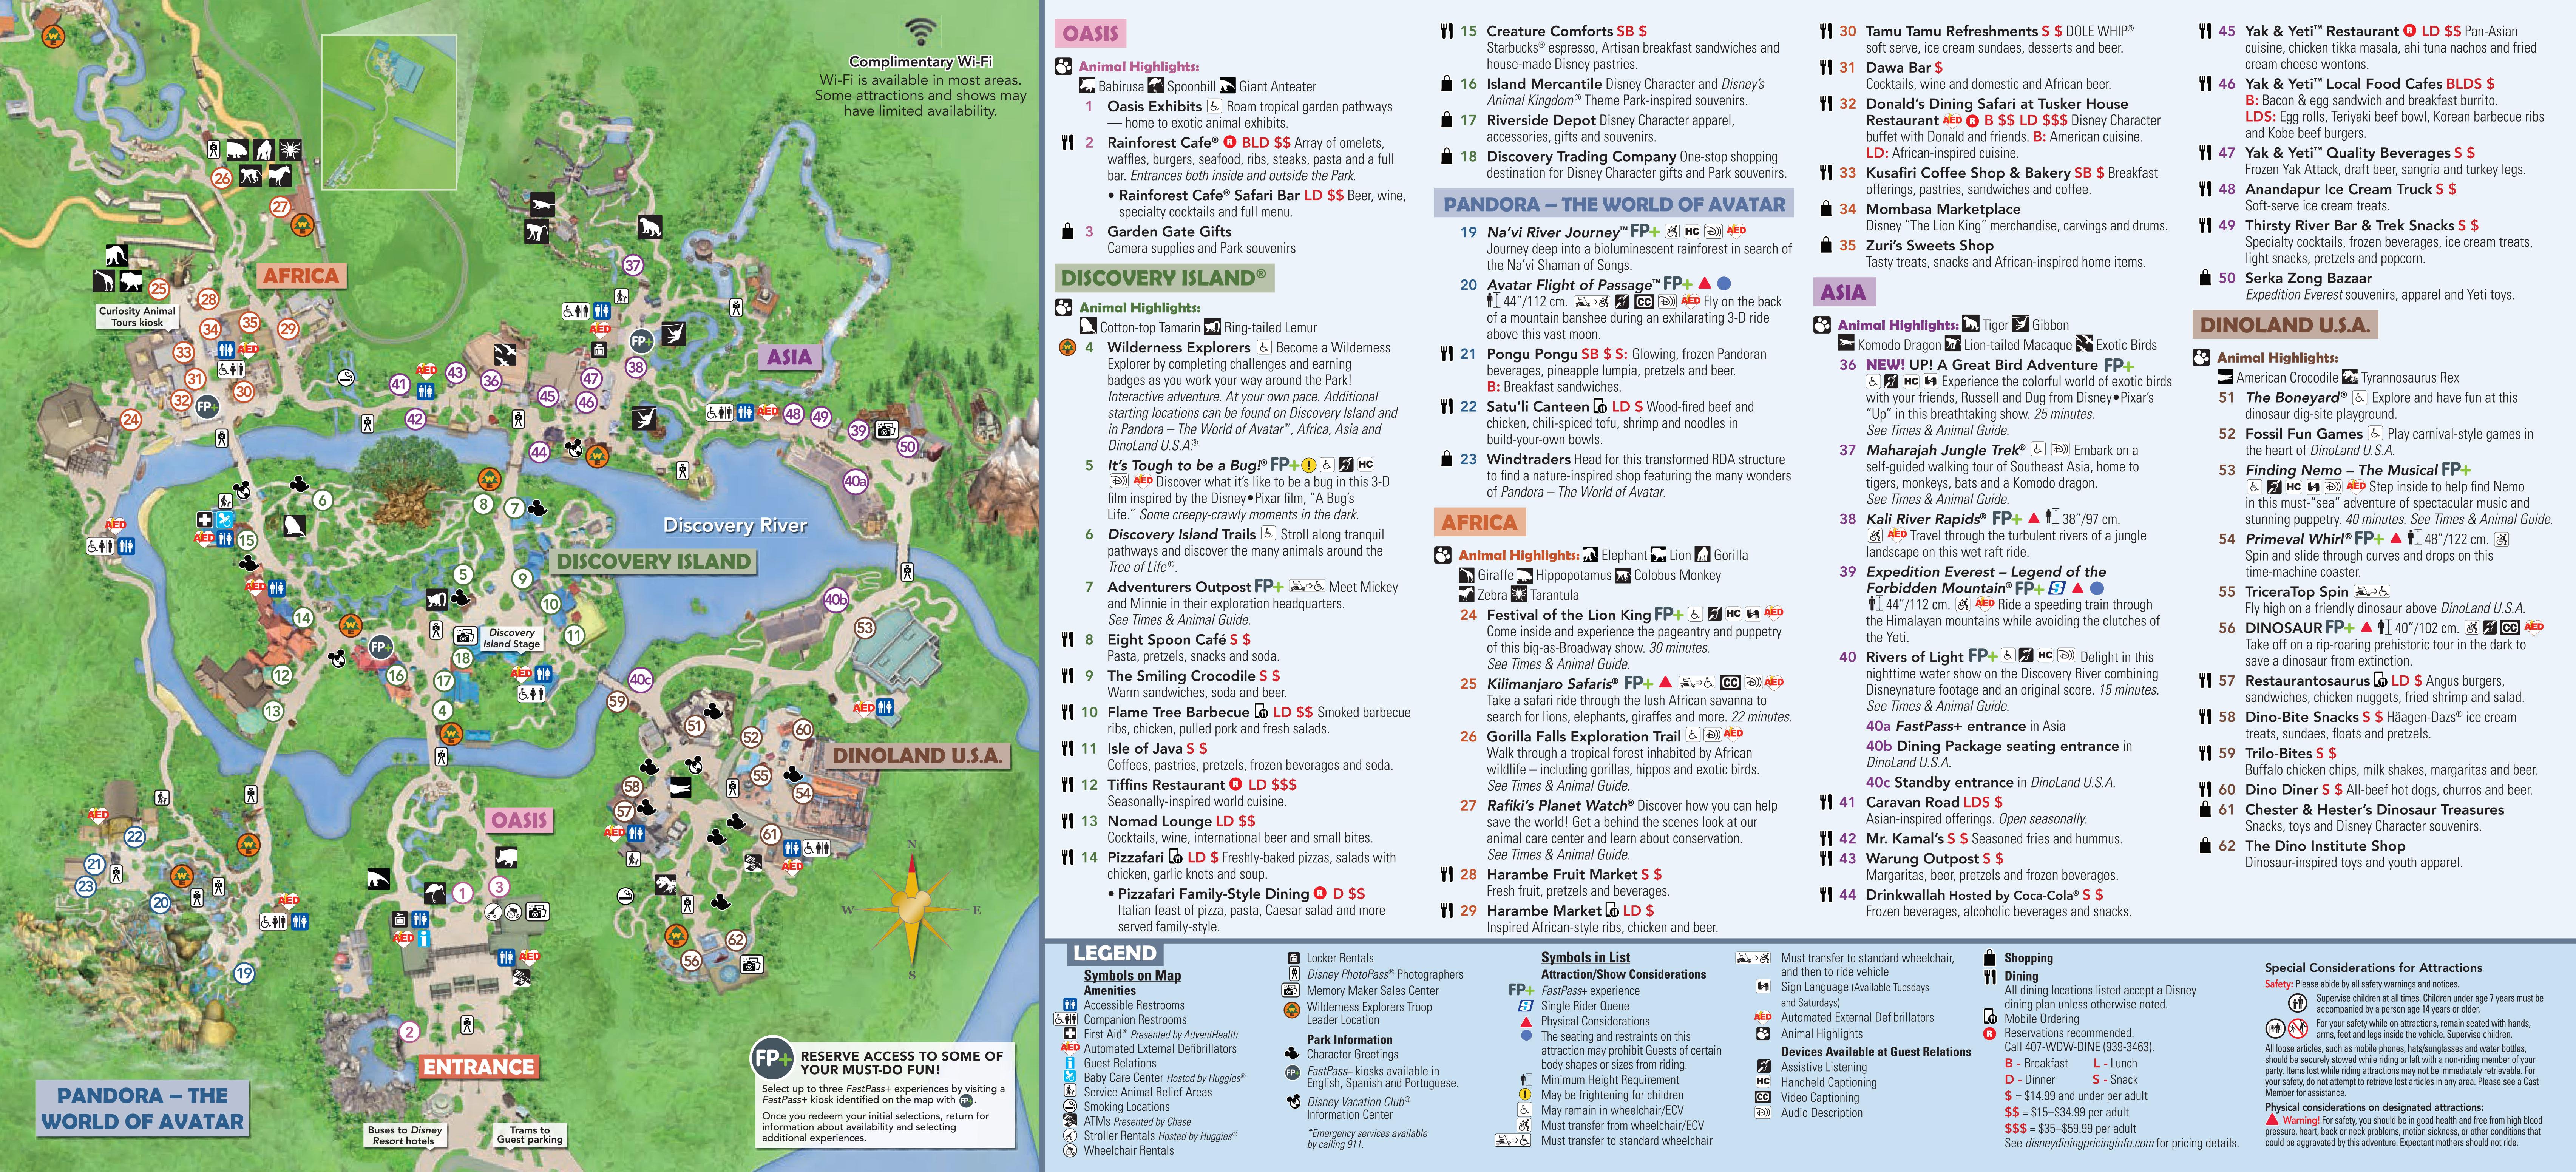 Epcot Festival Ot Arts 2019 Park Map Walt Disney World Other ...